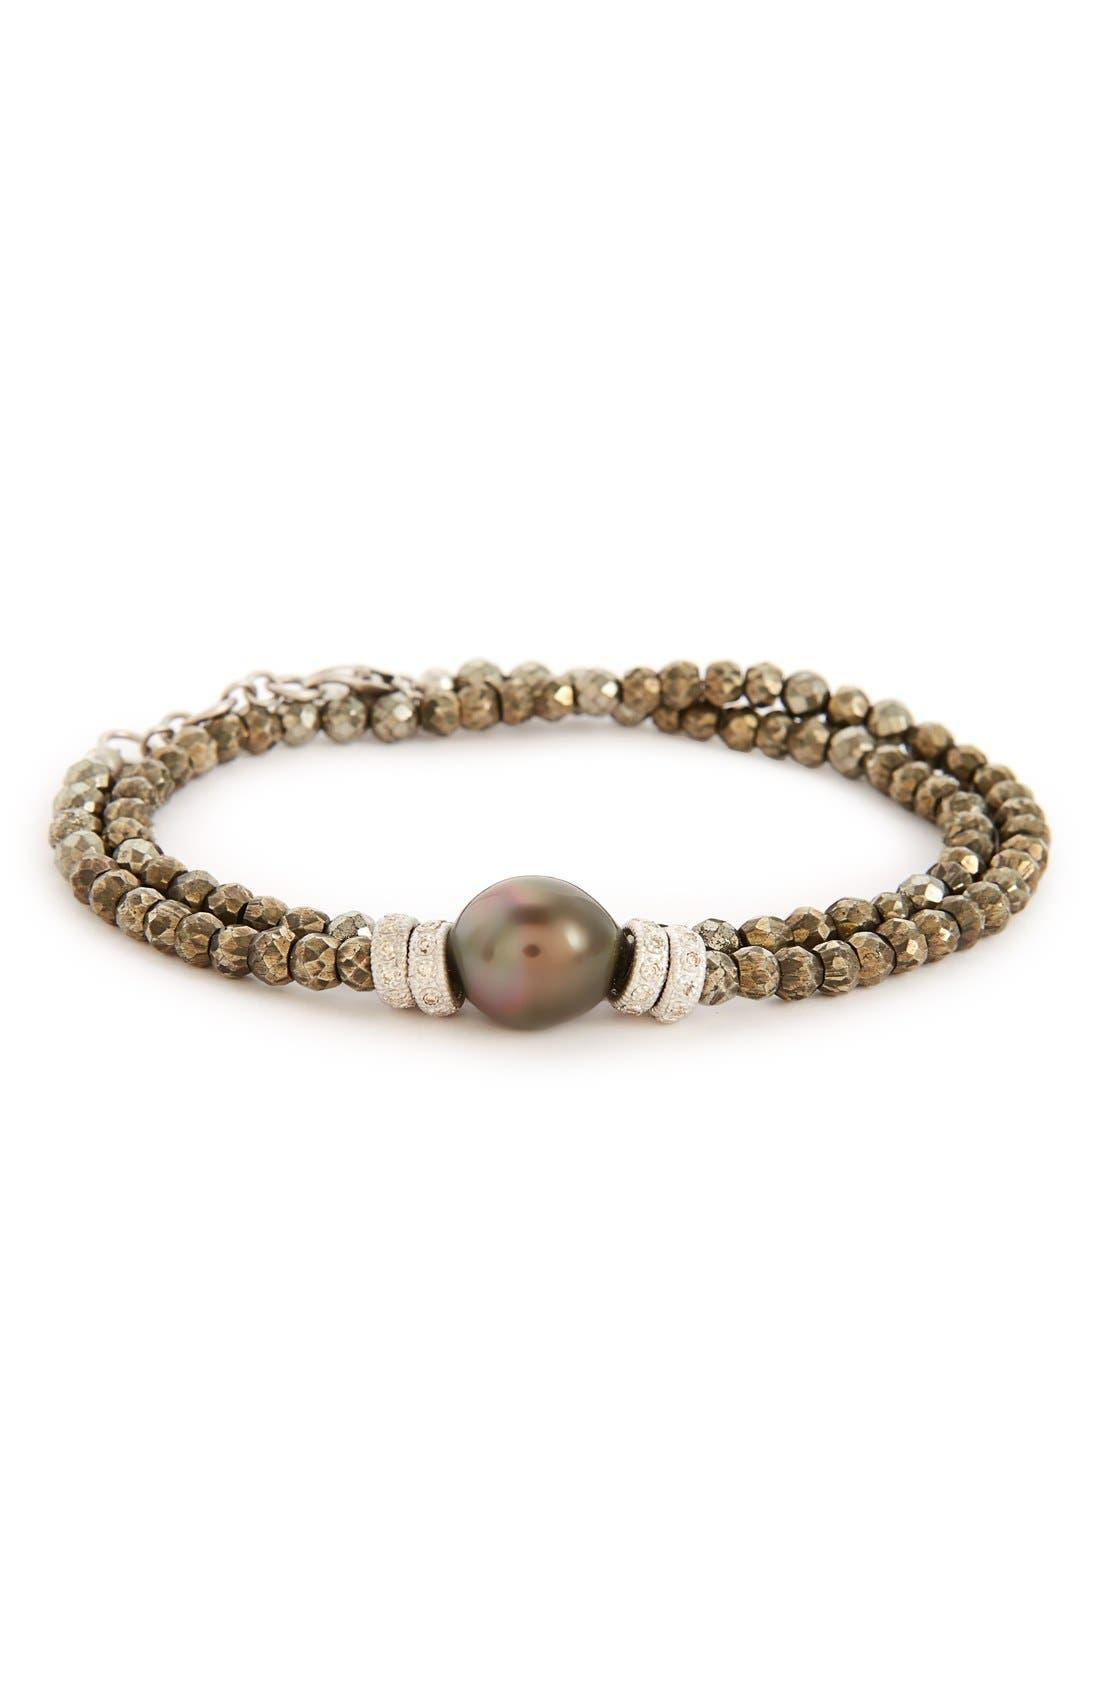 Main Image - Armenta Old World Semiprecious Stone & Diamond Beaded Bracelet